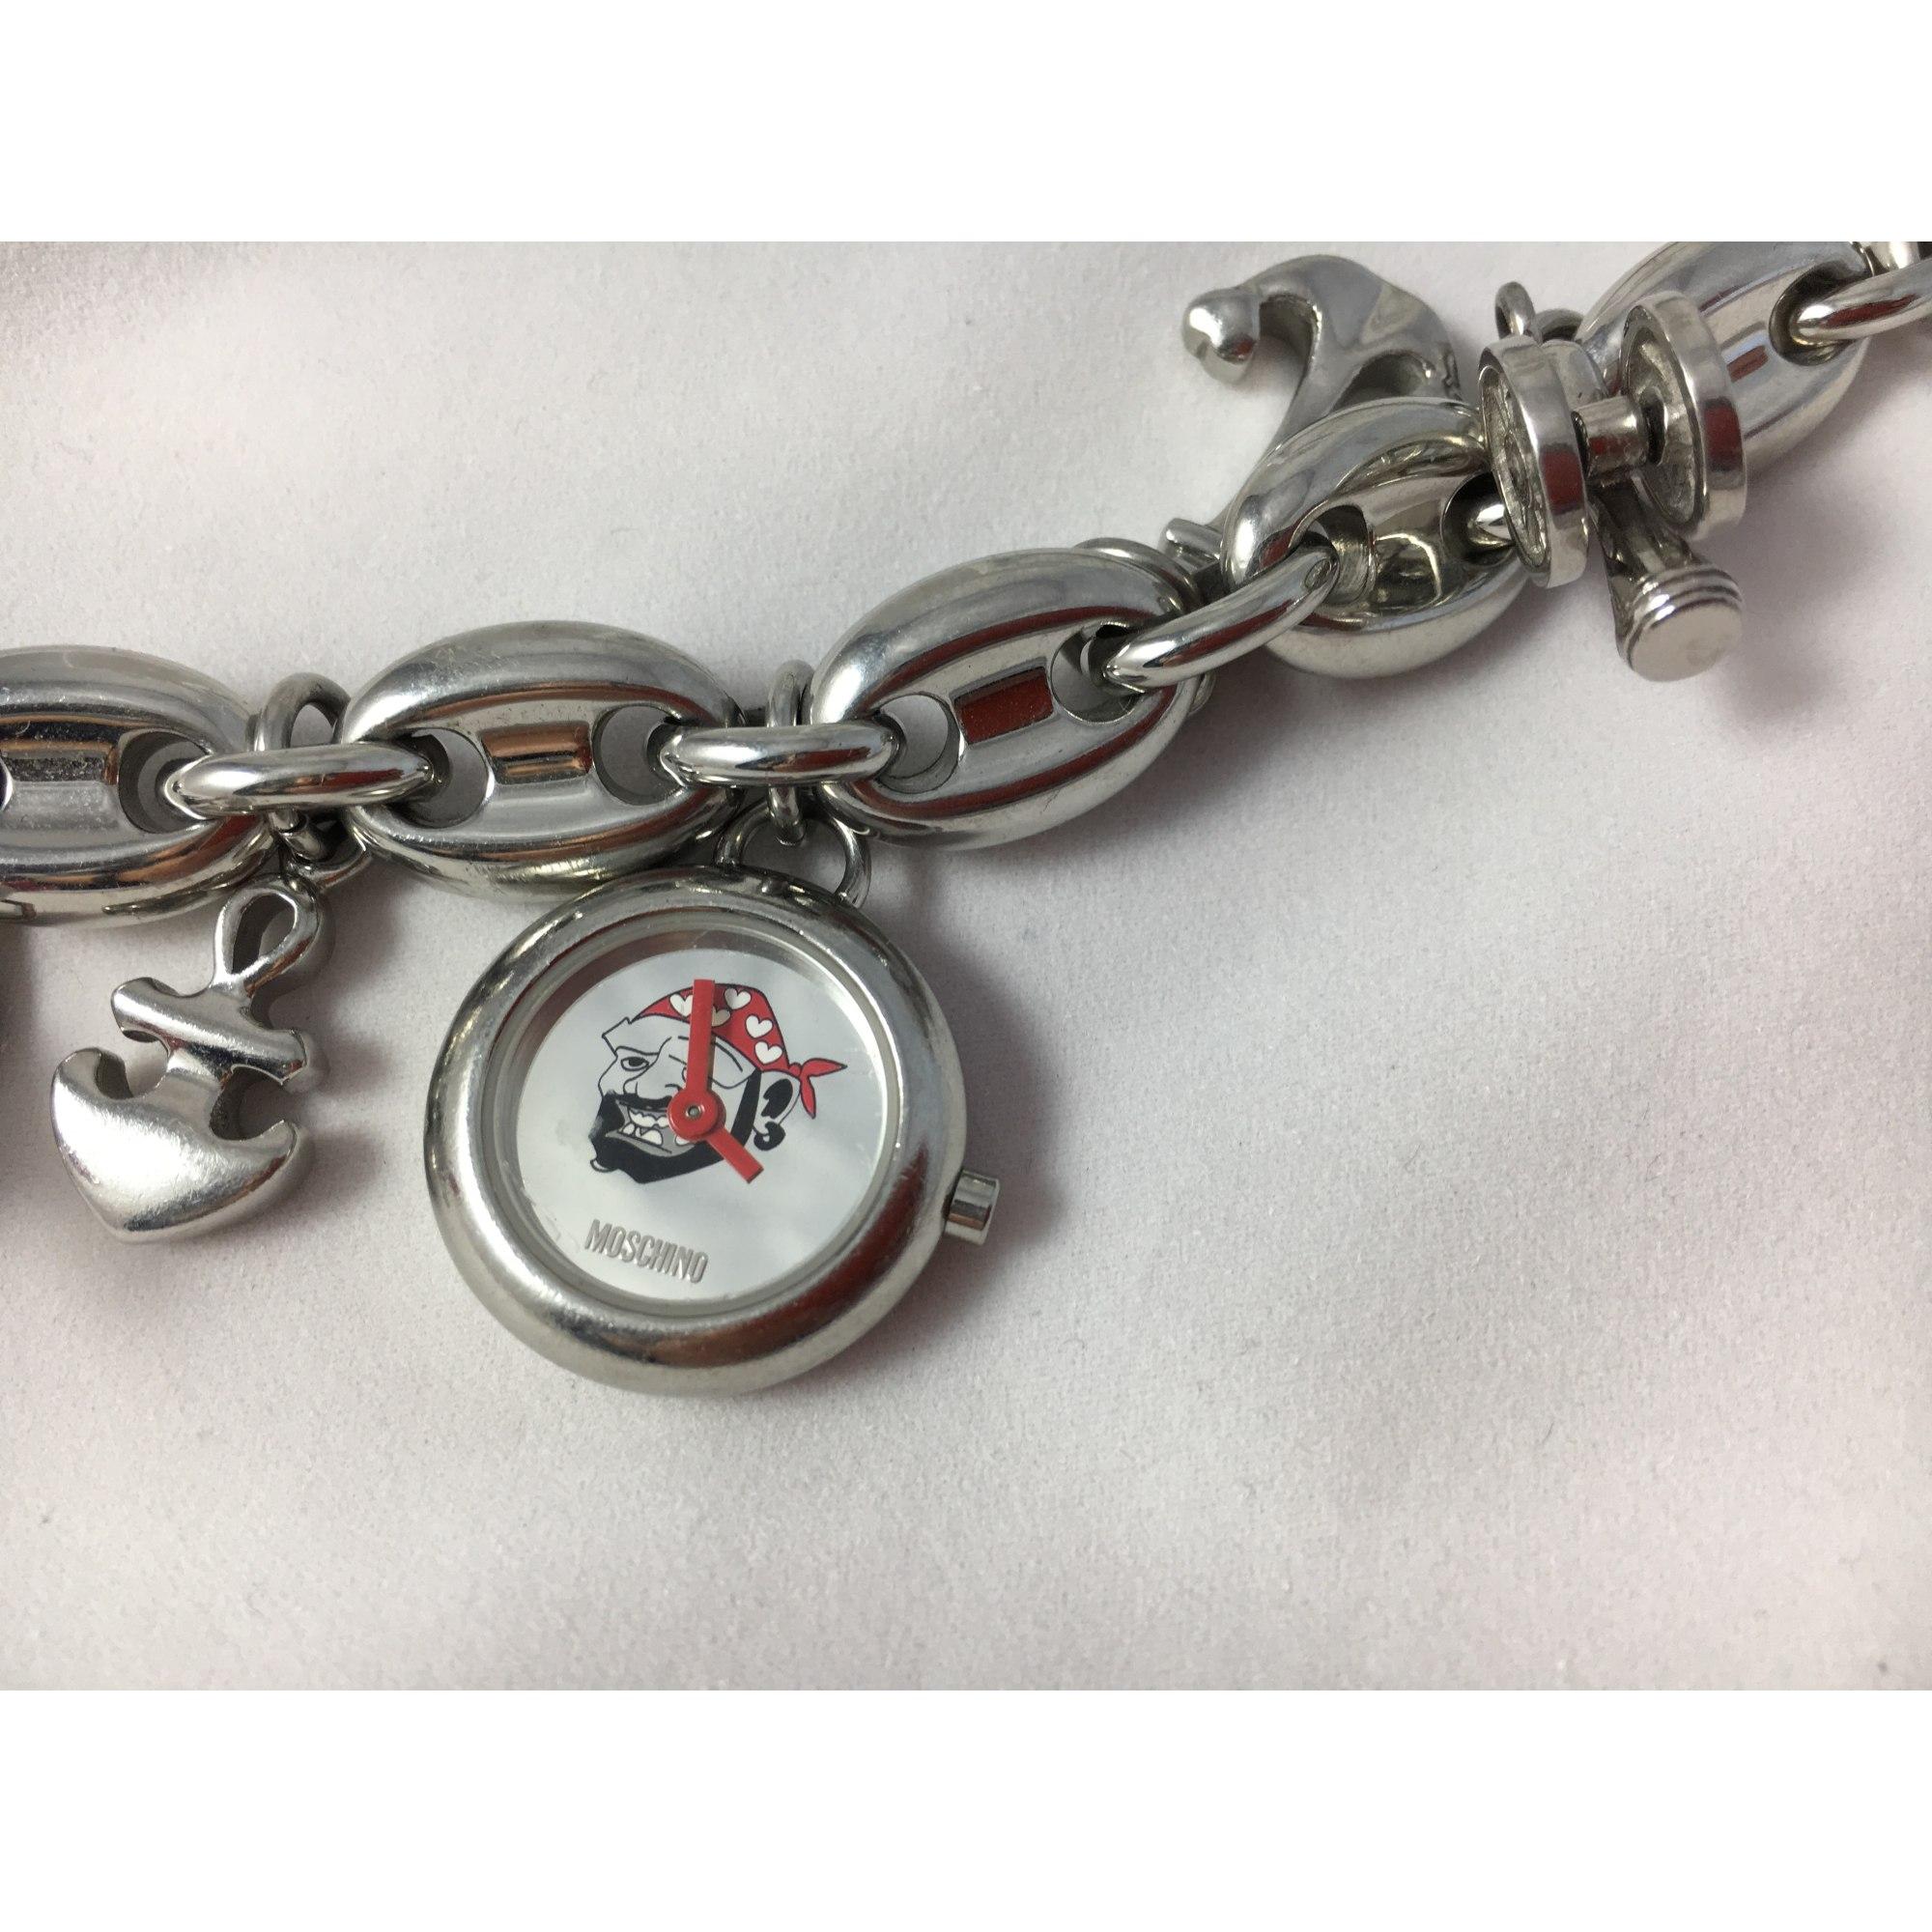 Moschino Watch | eBay